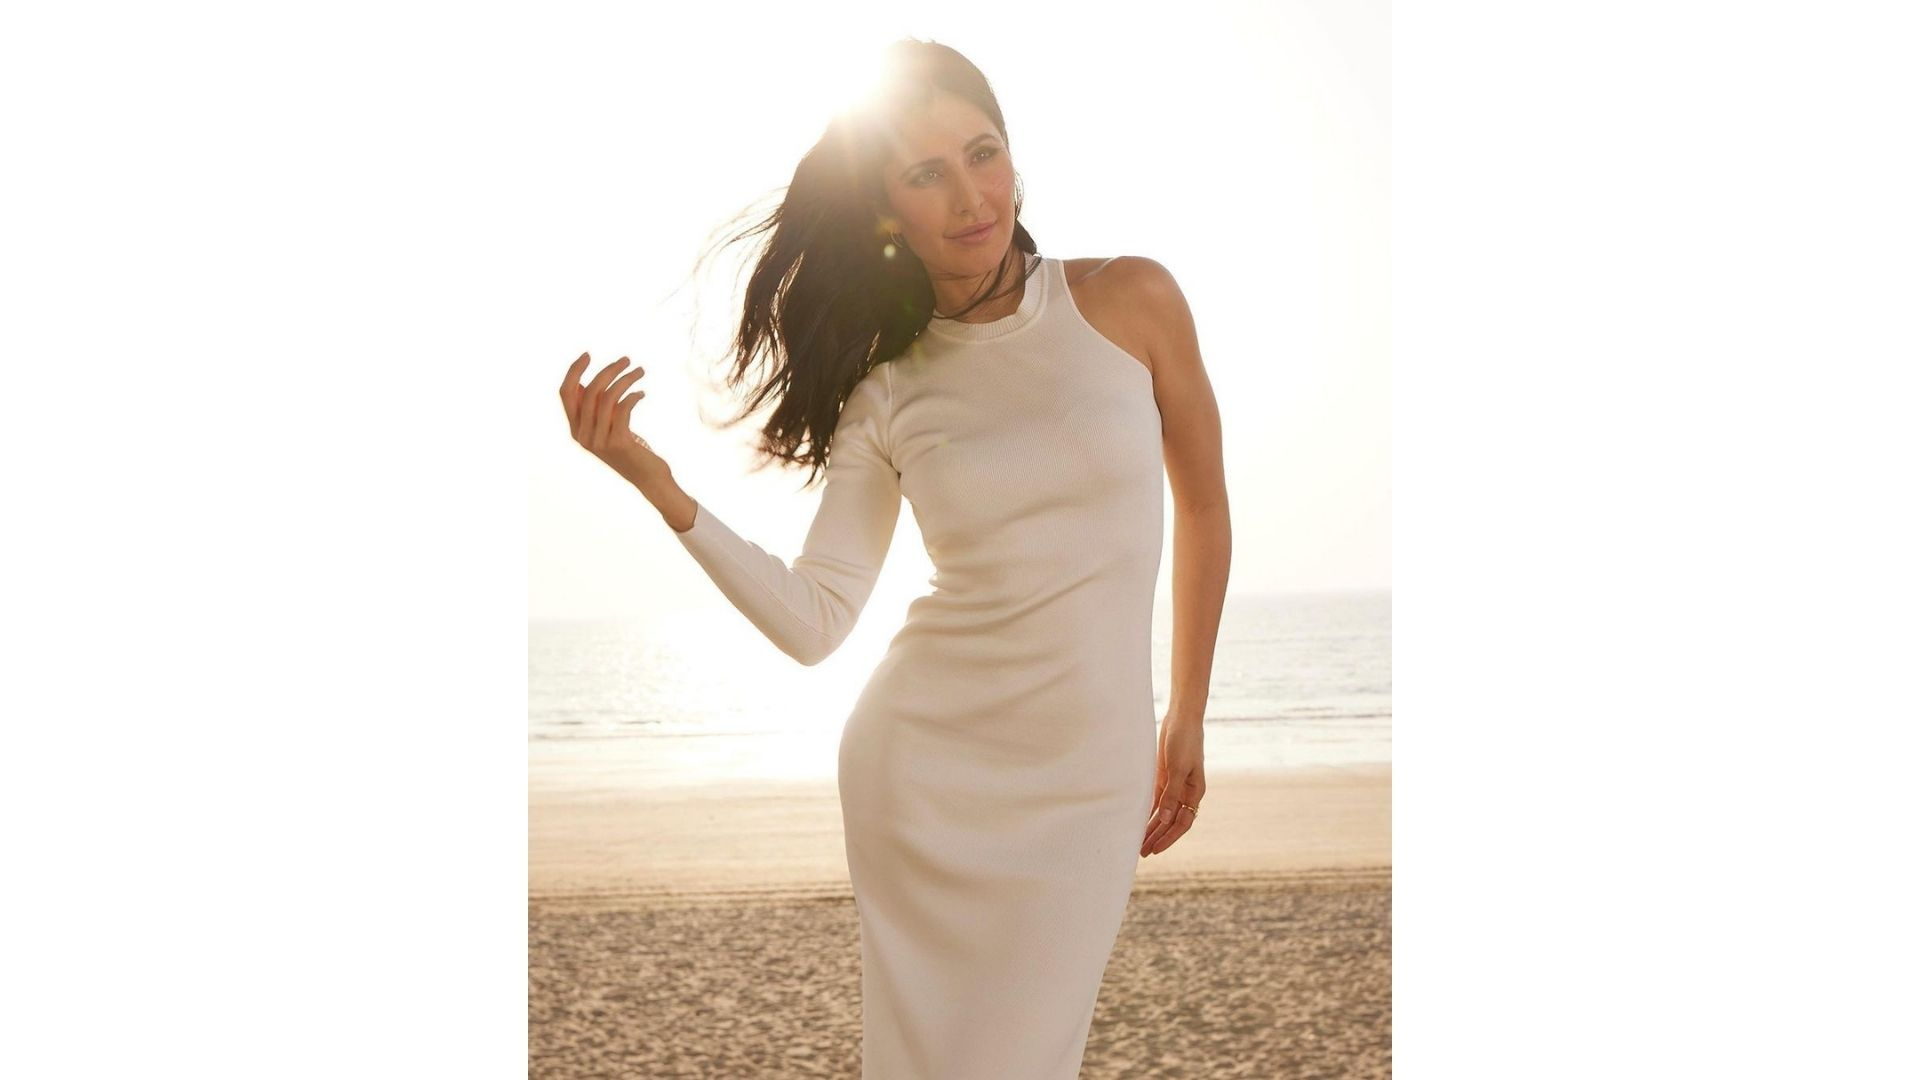 Katrina Kaif's Sunday Beach Post Has Left Her Fans Gushing Over Her Beauty- Pics Inside